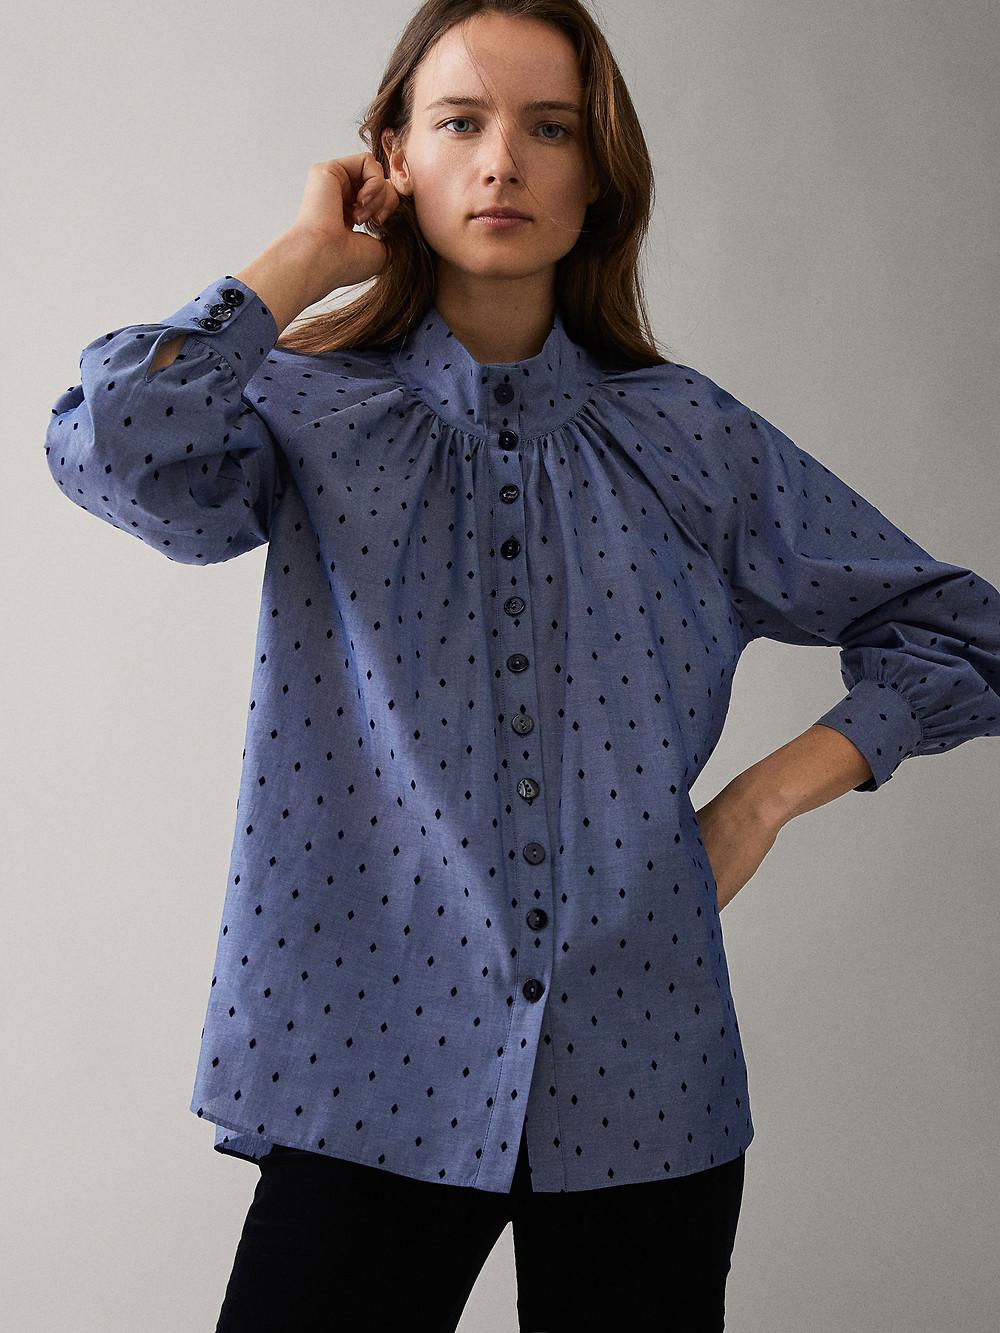 Shirt, Massimo Dutti (€ 29.95)